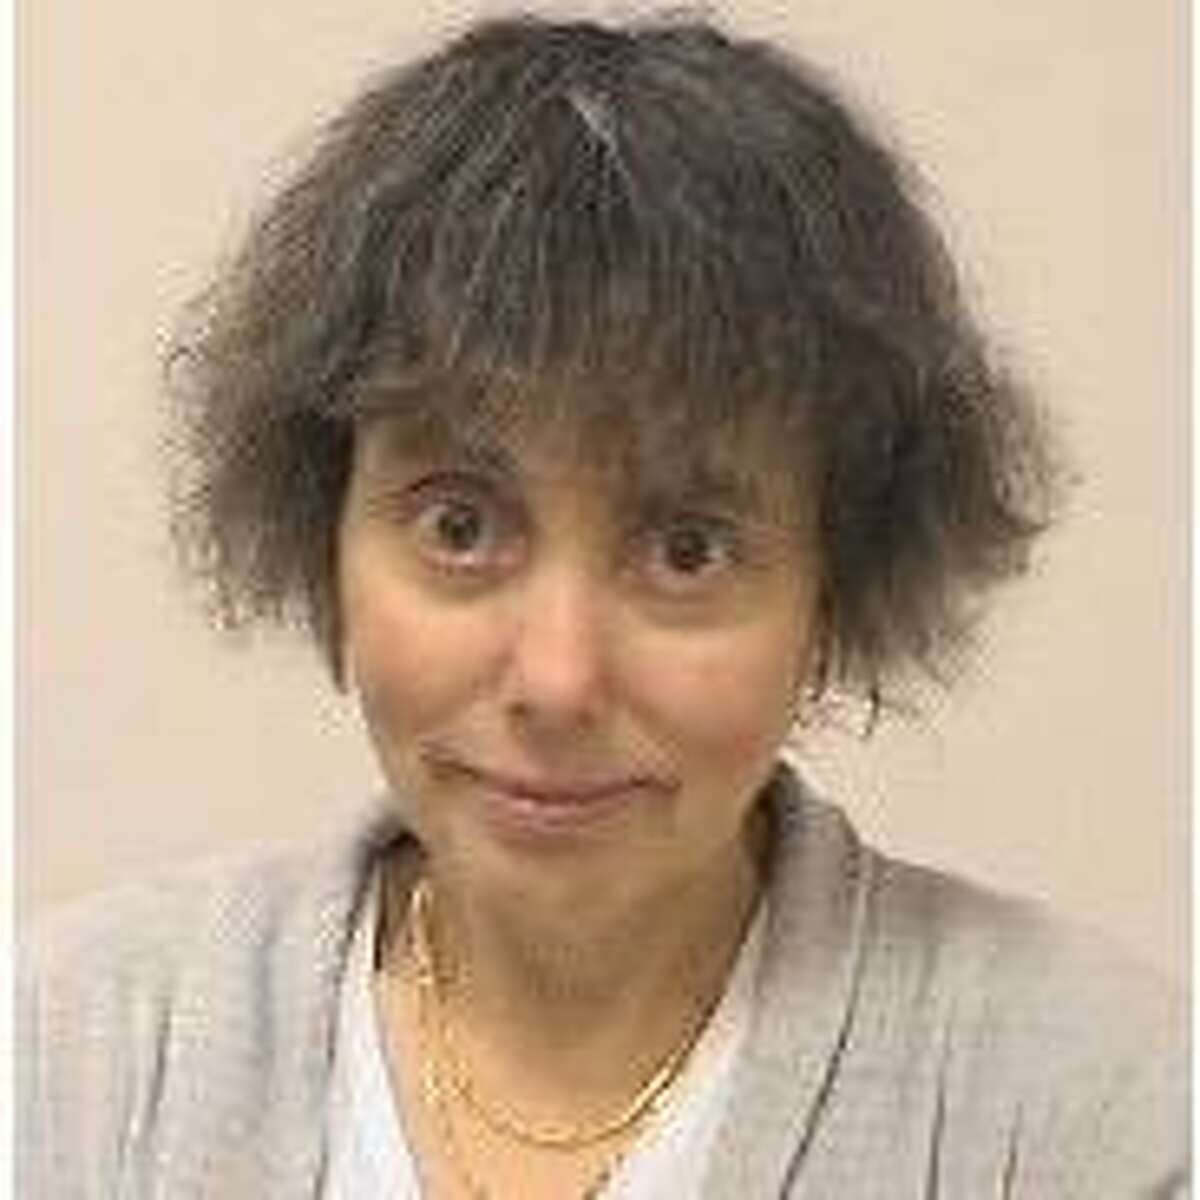 Lynn Uhlfelder Berman of the Greenwich Time